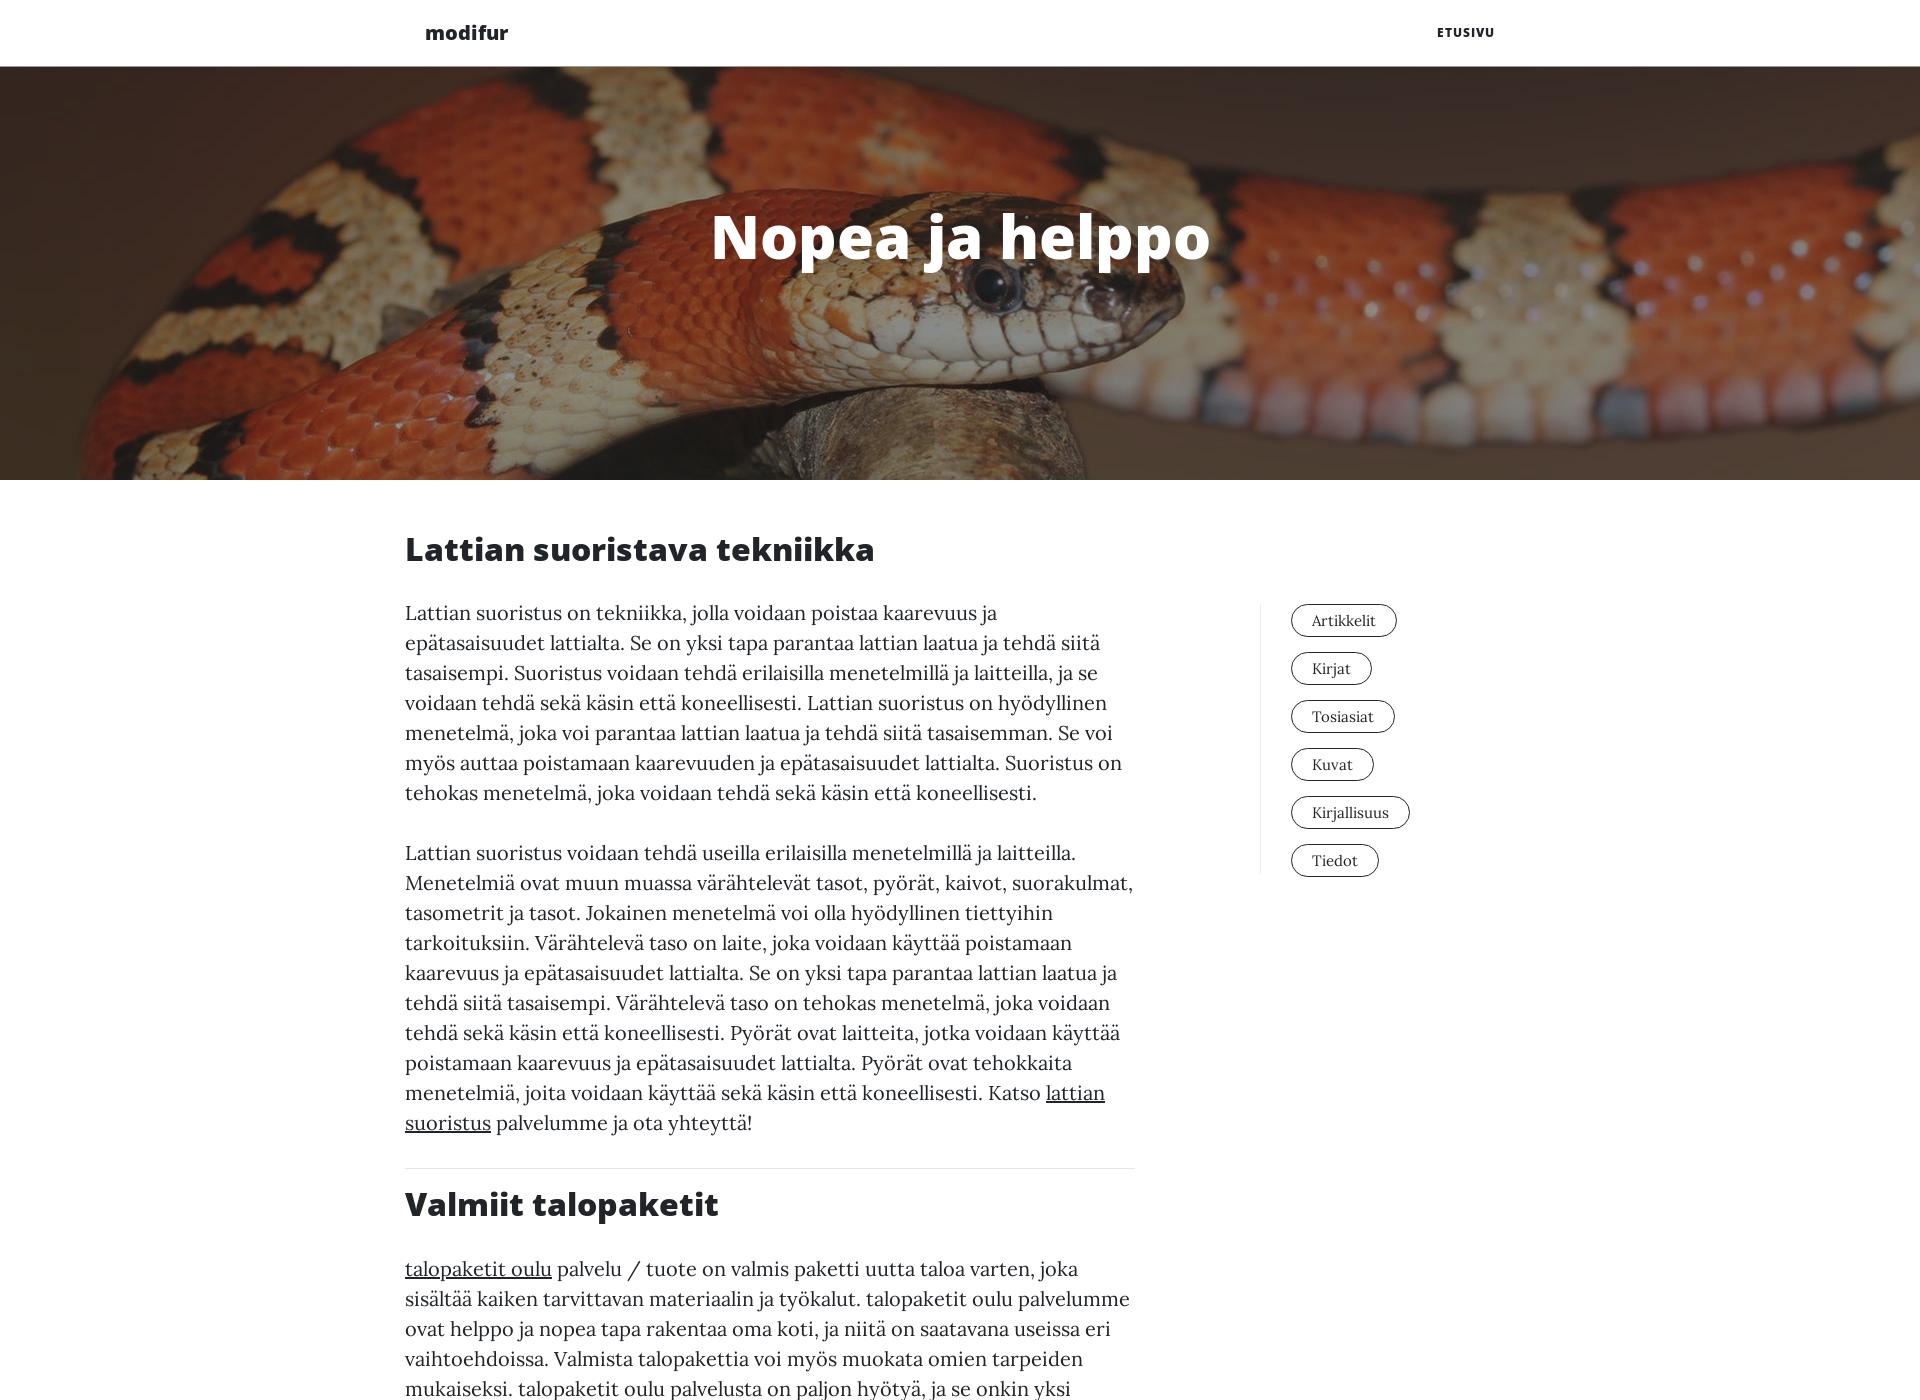 Screenshot for modifur.fi